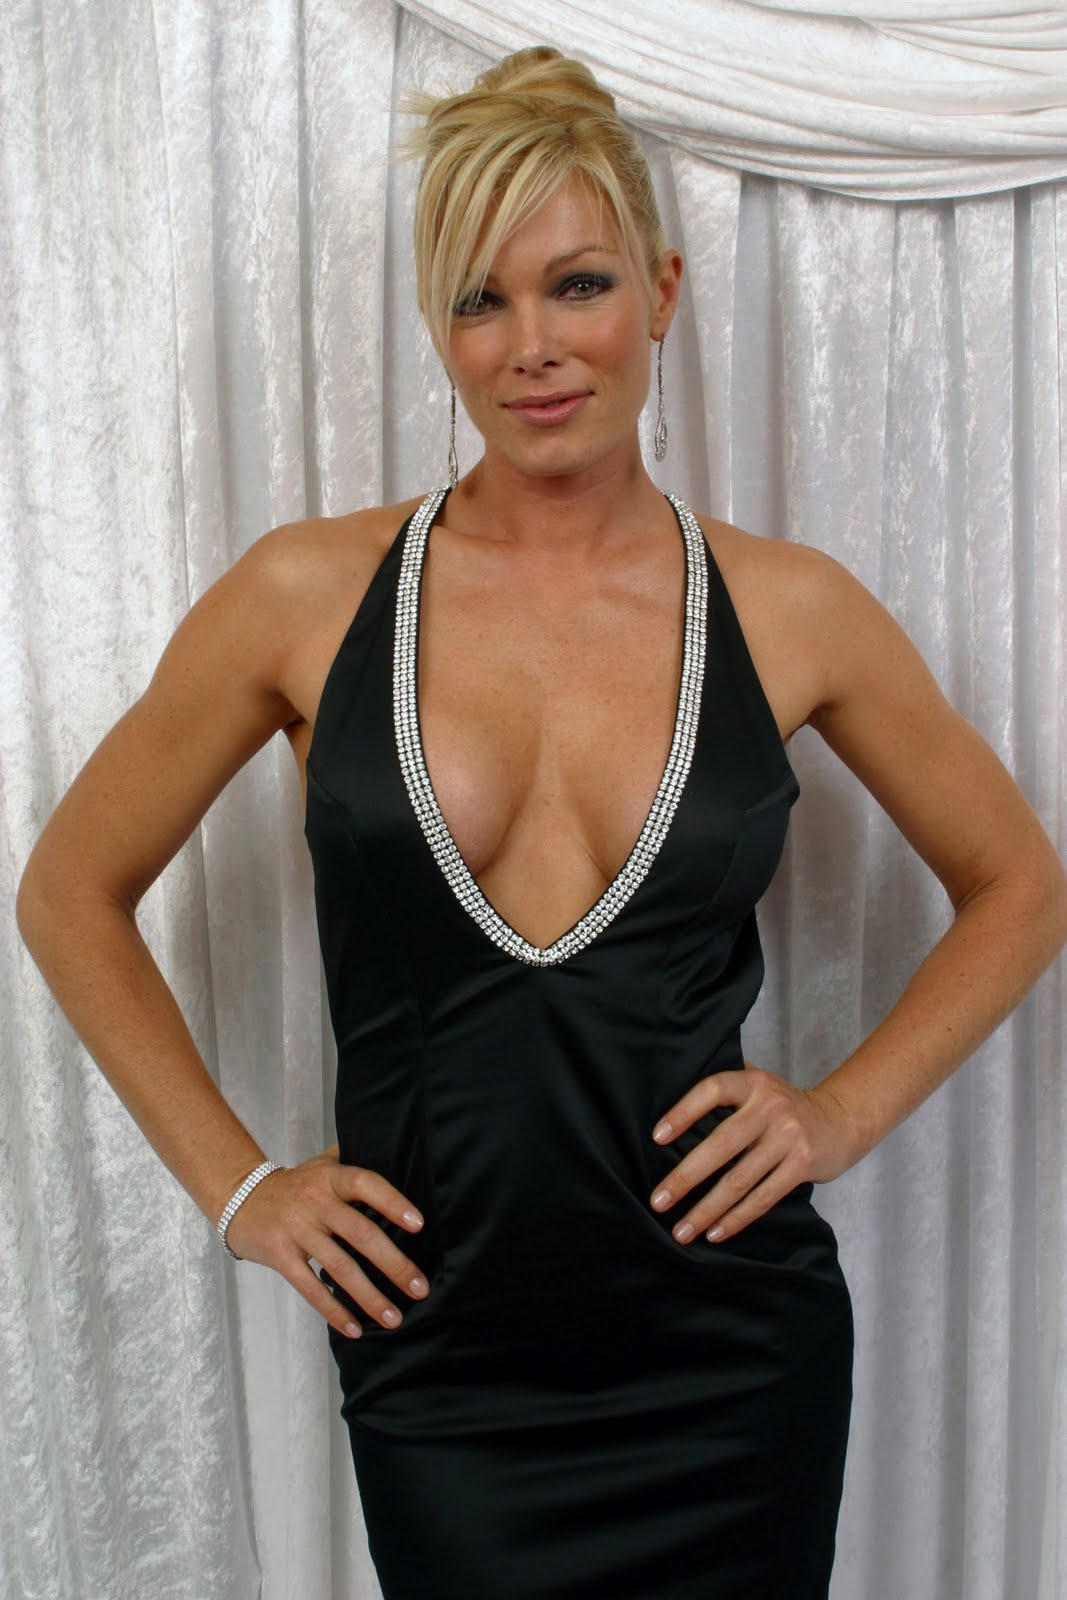 Espanolas letizia pagina mujer argentina famosa desnuda 50